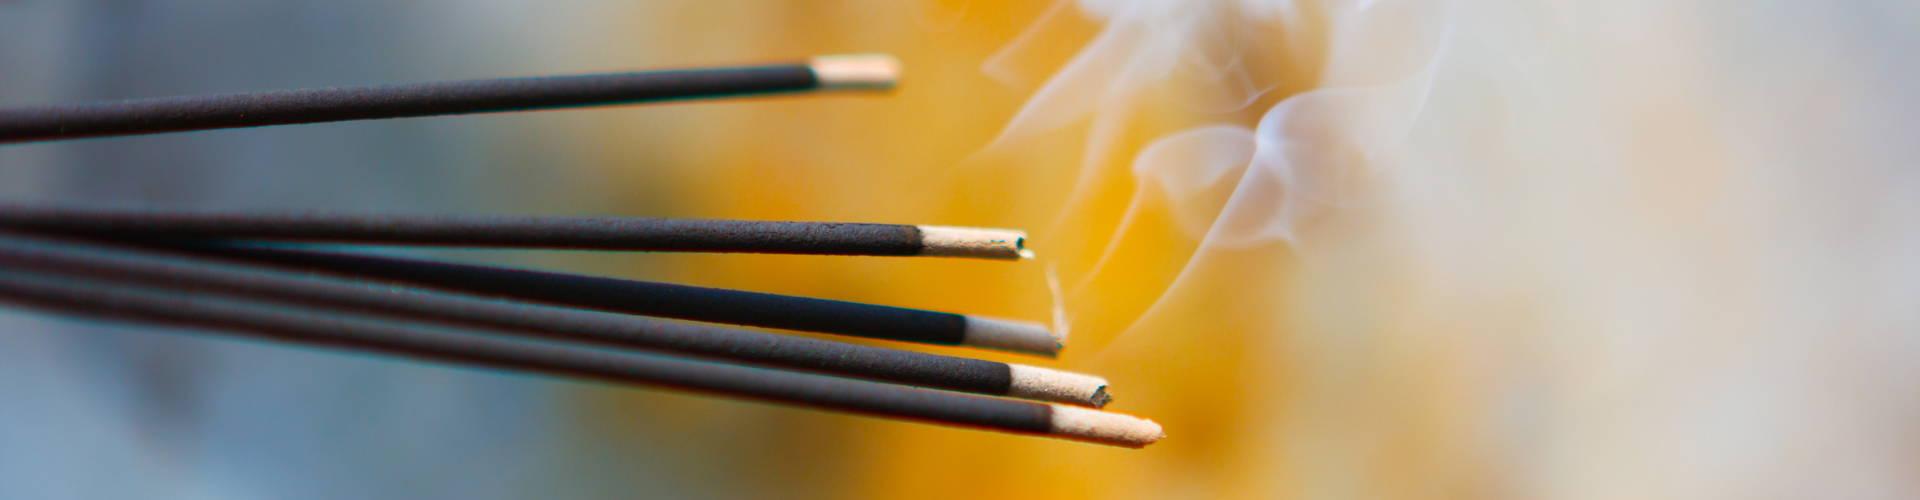 incense burning